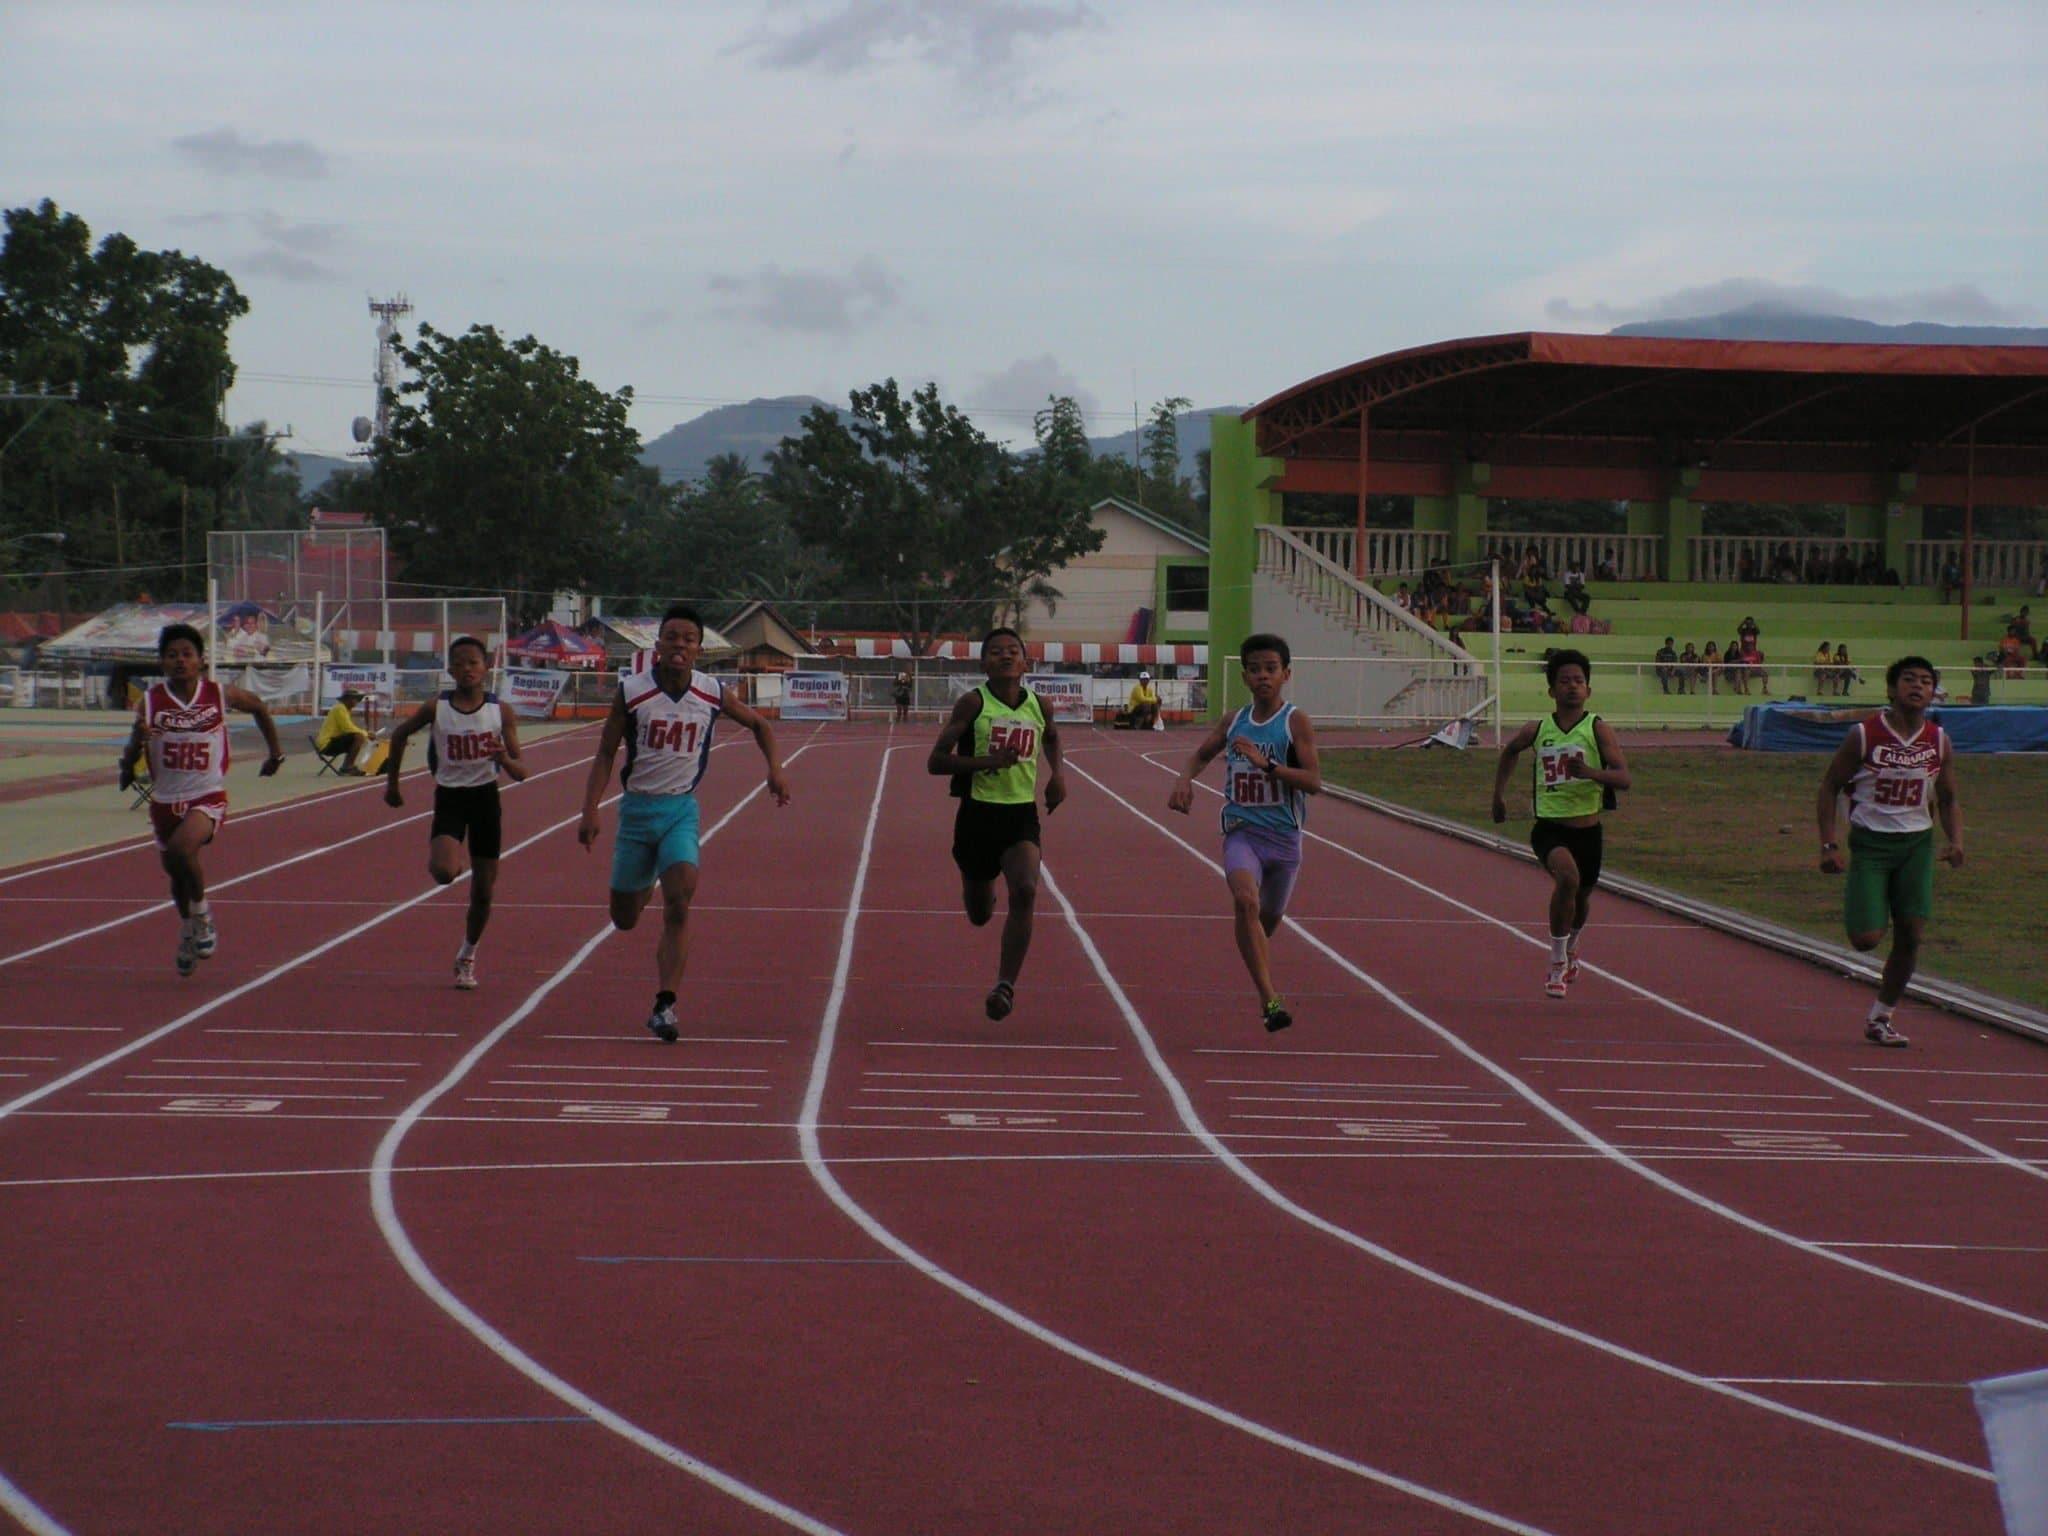 Requillas (641) winning the 200m Elementary Boys